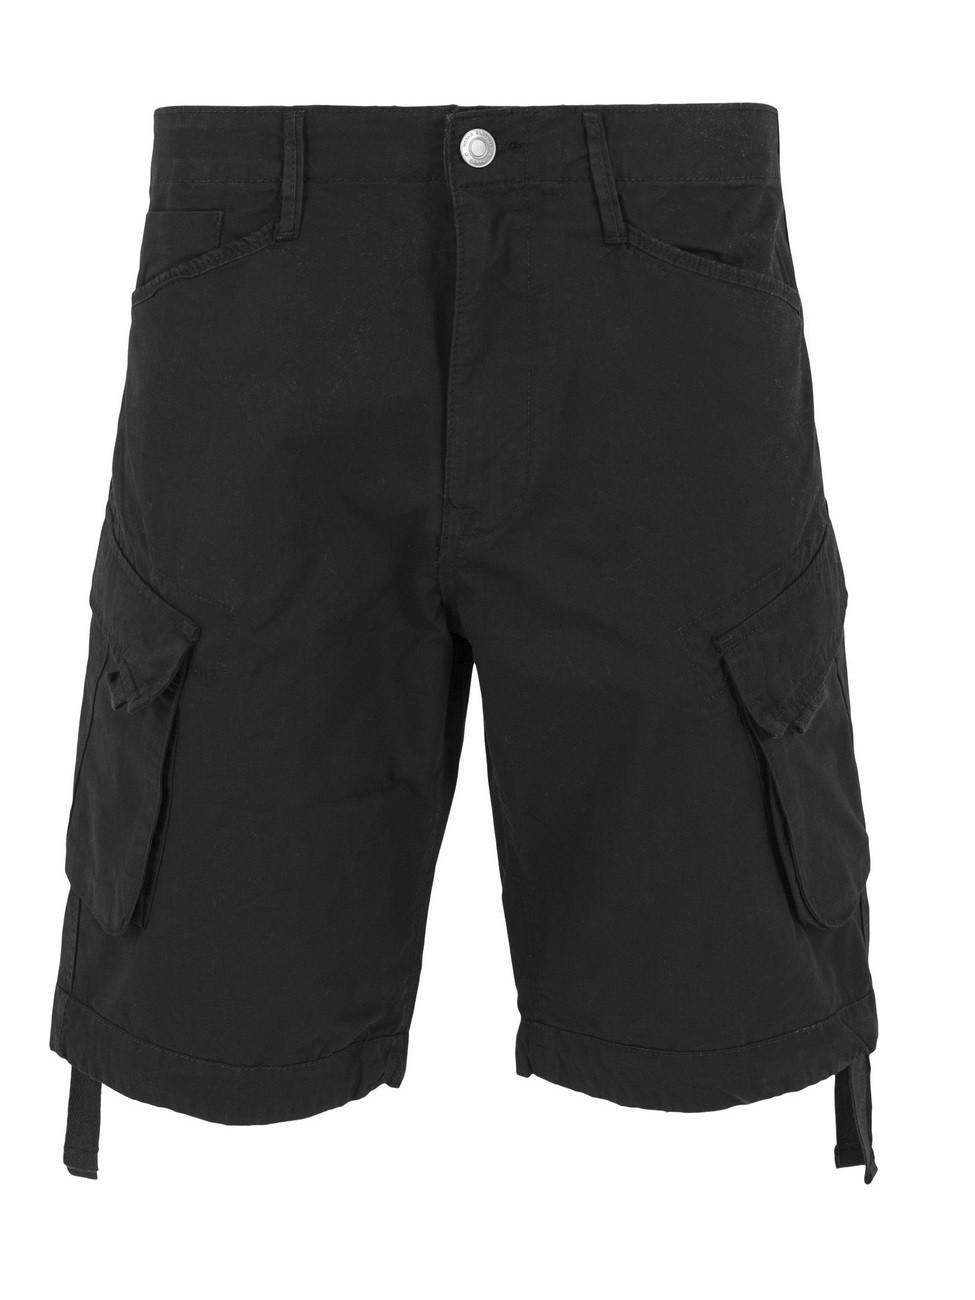 Urban Classics Herren Cargo Twill Shorts